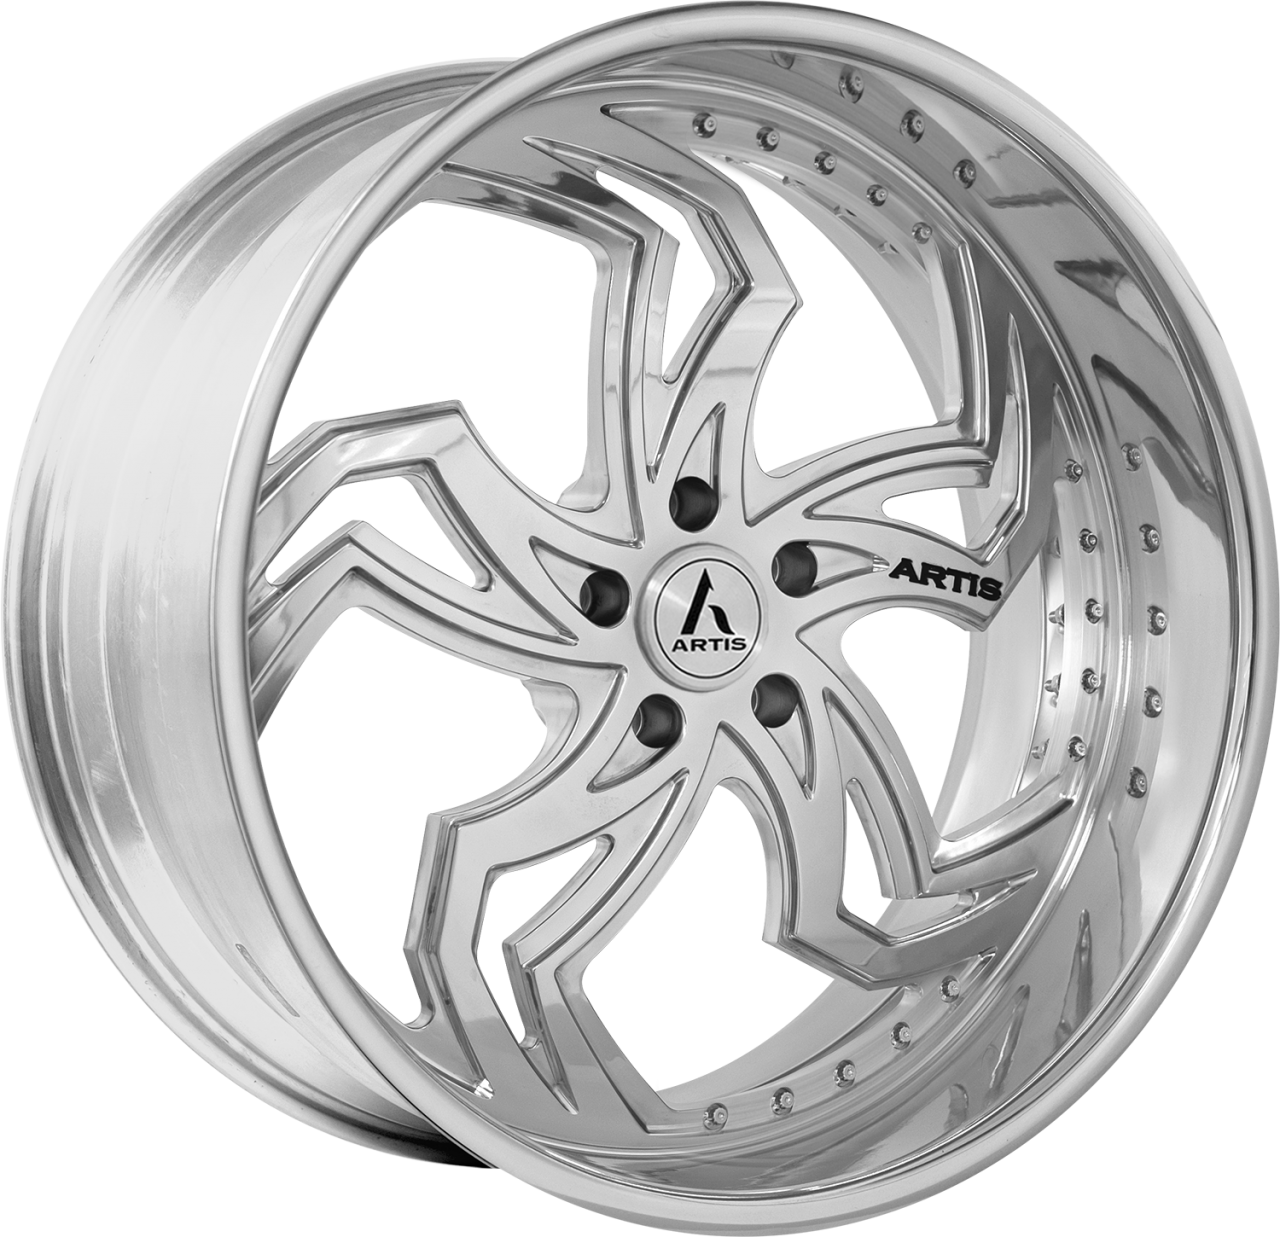 Artis Forged Fulton-M wheel with Brushed finish